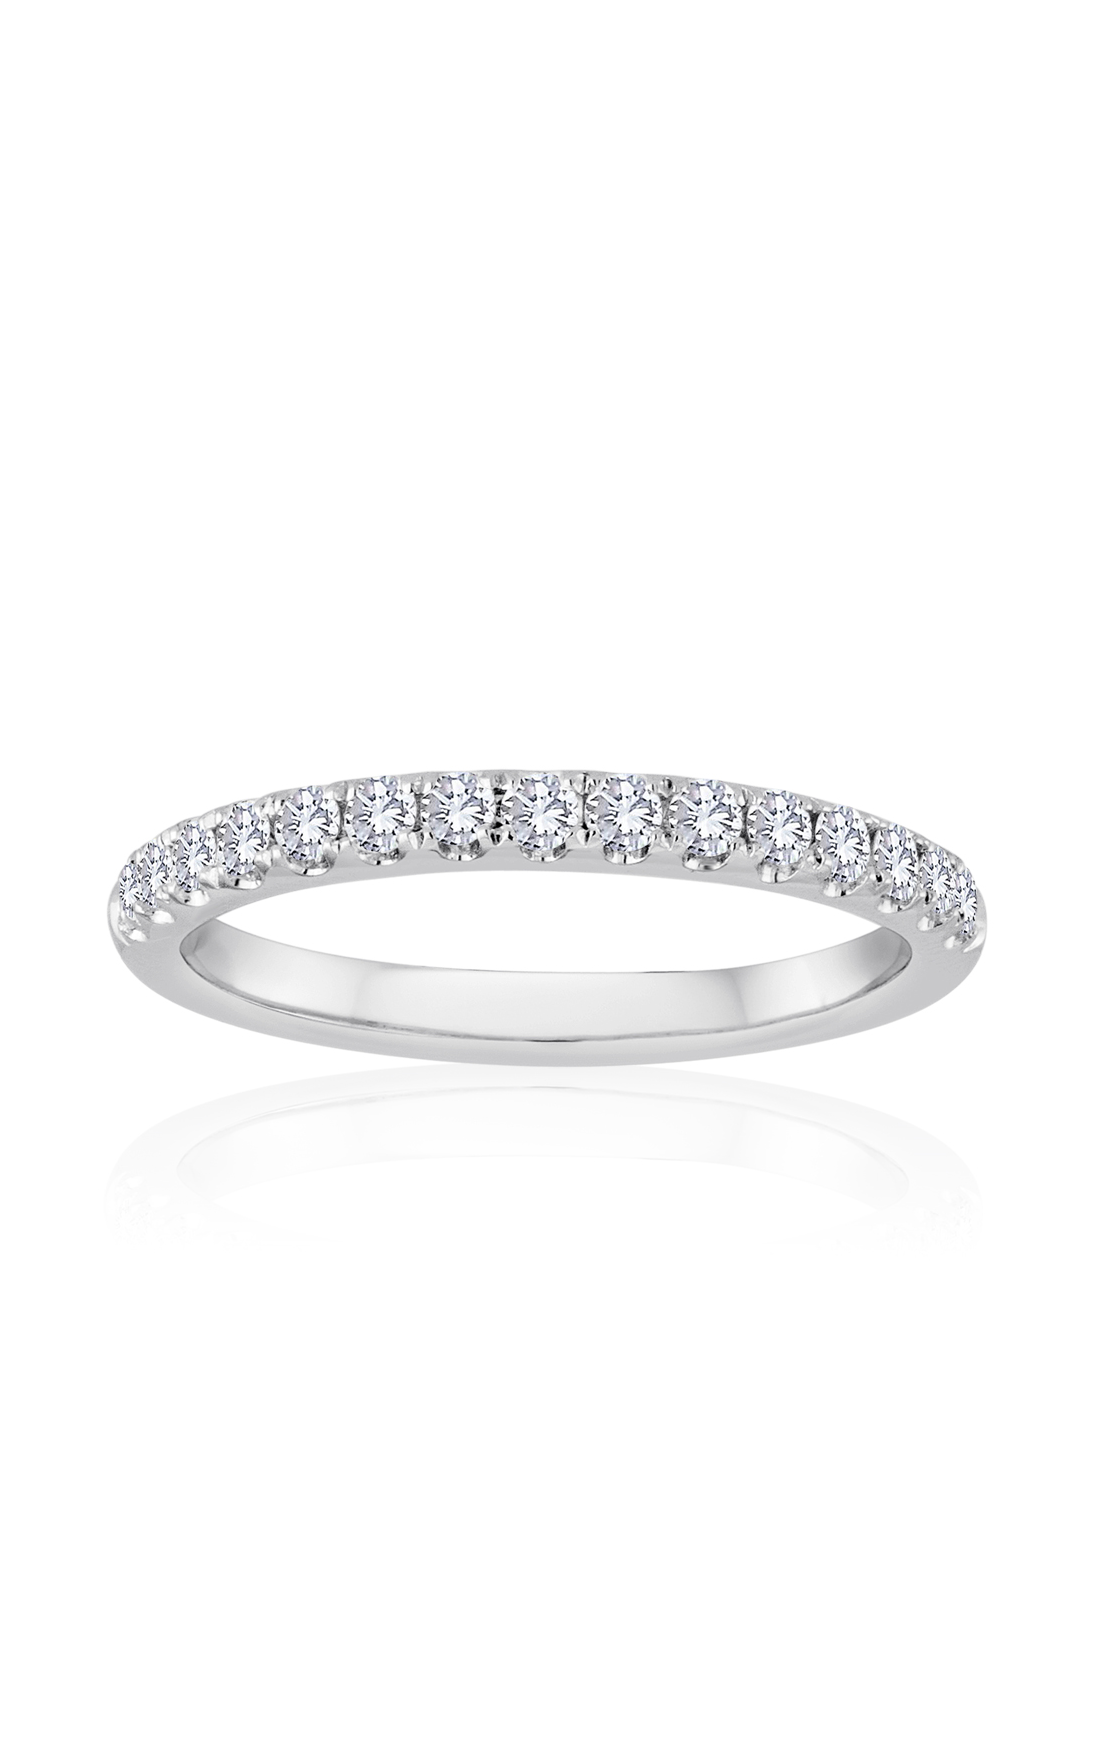 Imagine Bridal Fashion Rings 70156D-3 4 product image